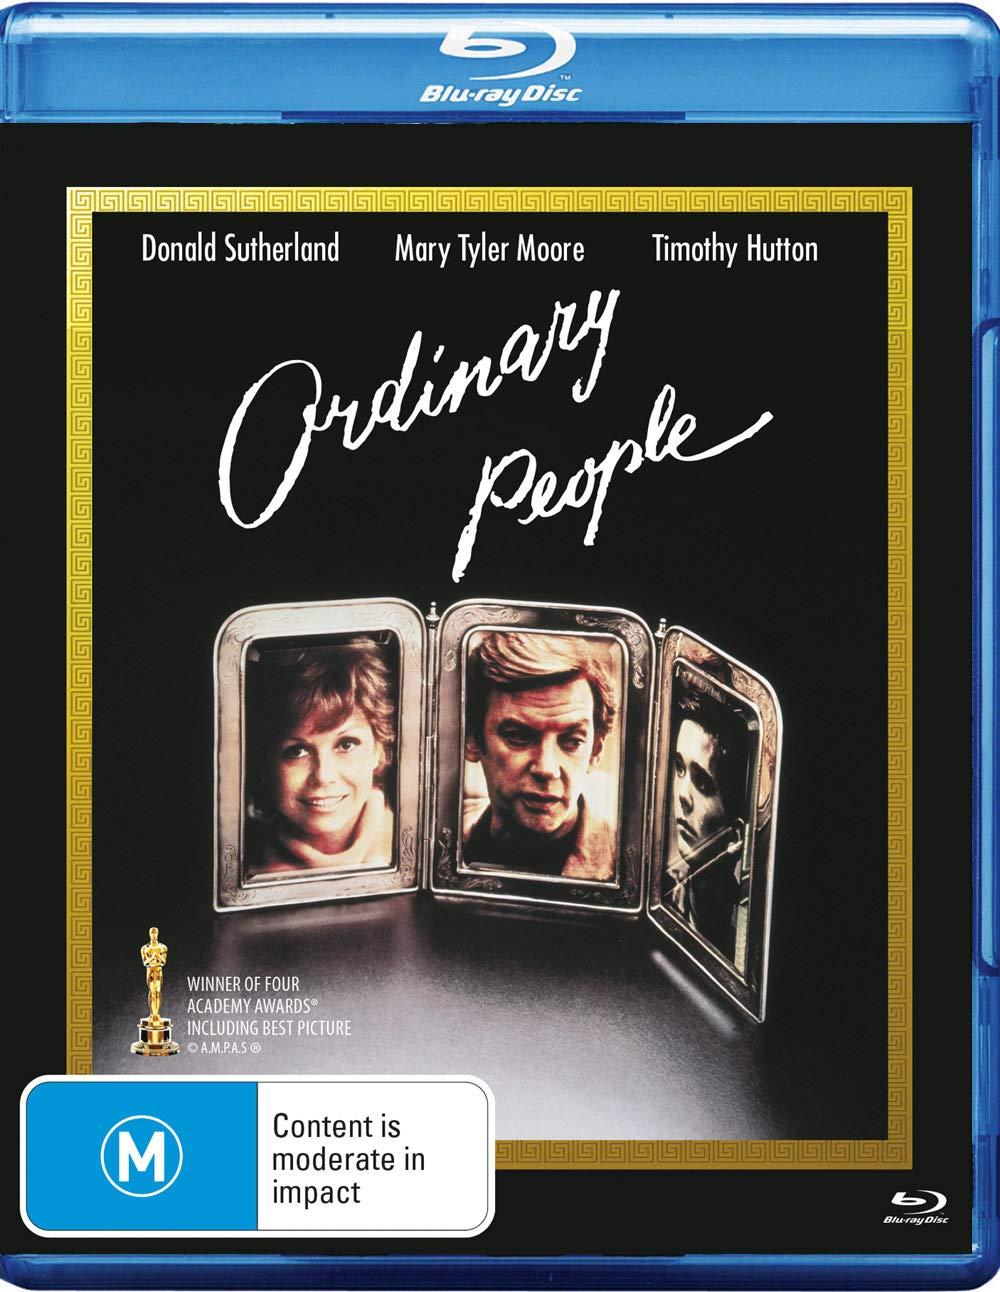 Ordinary People Blu-ray | Donald Sutherland, Mary Tyler Moore, Timothy Hutton | NON-USA Format | Region B Import Australia